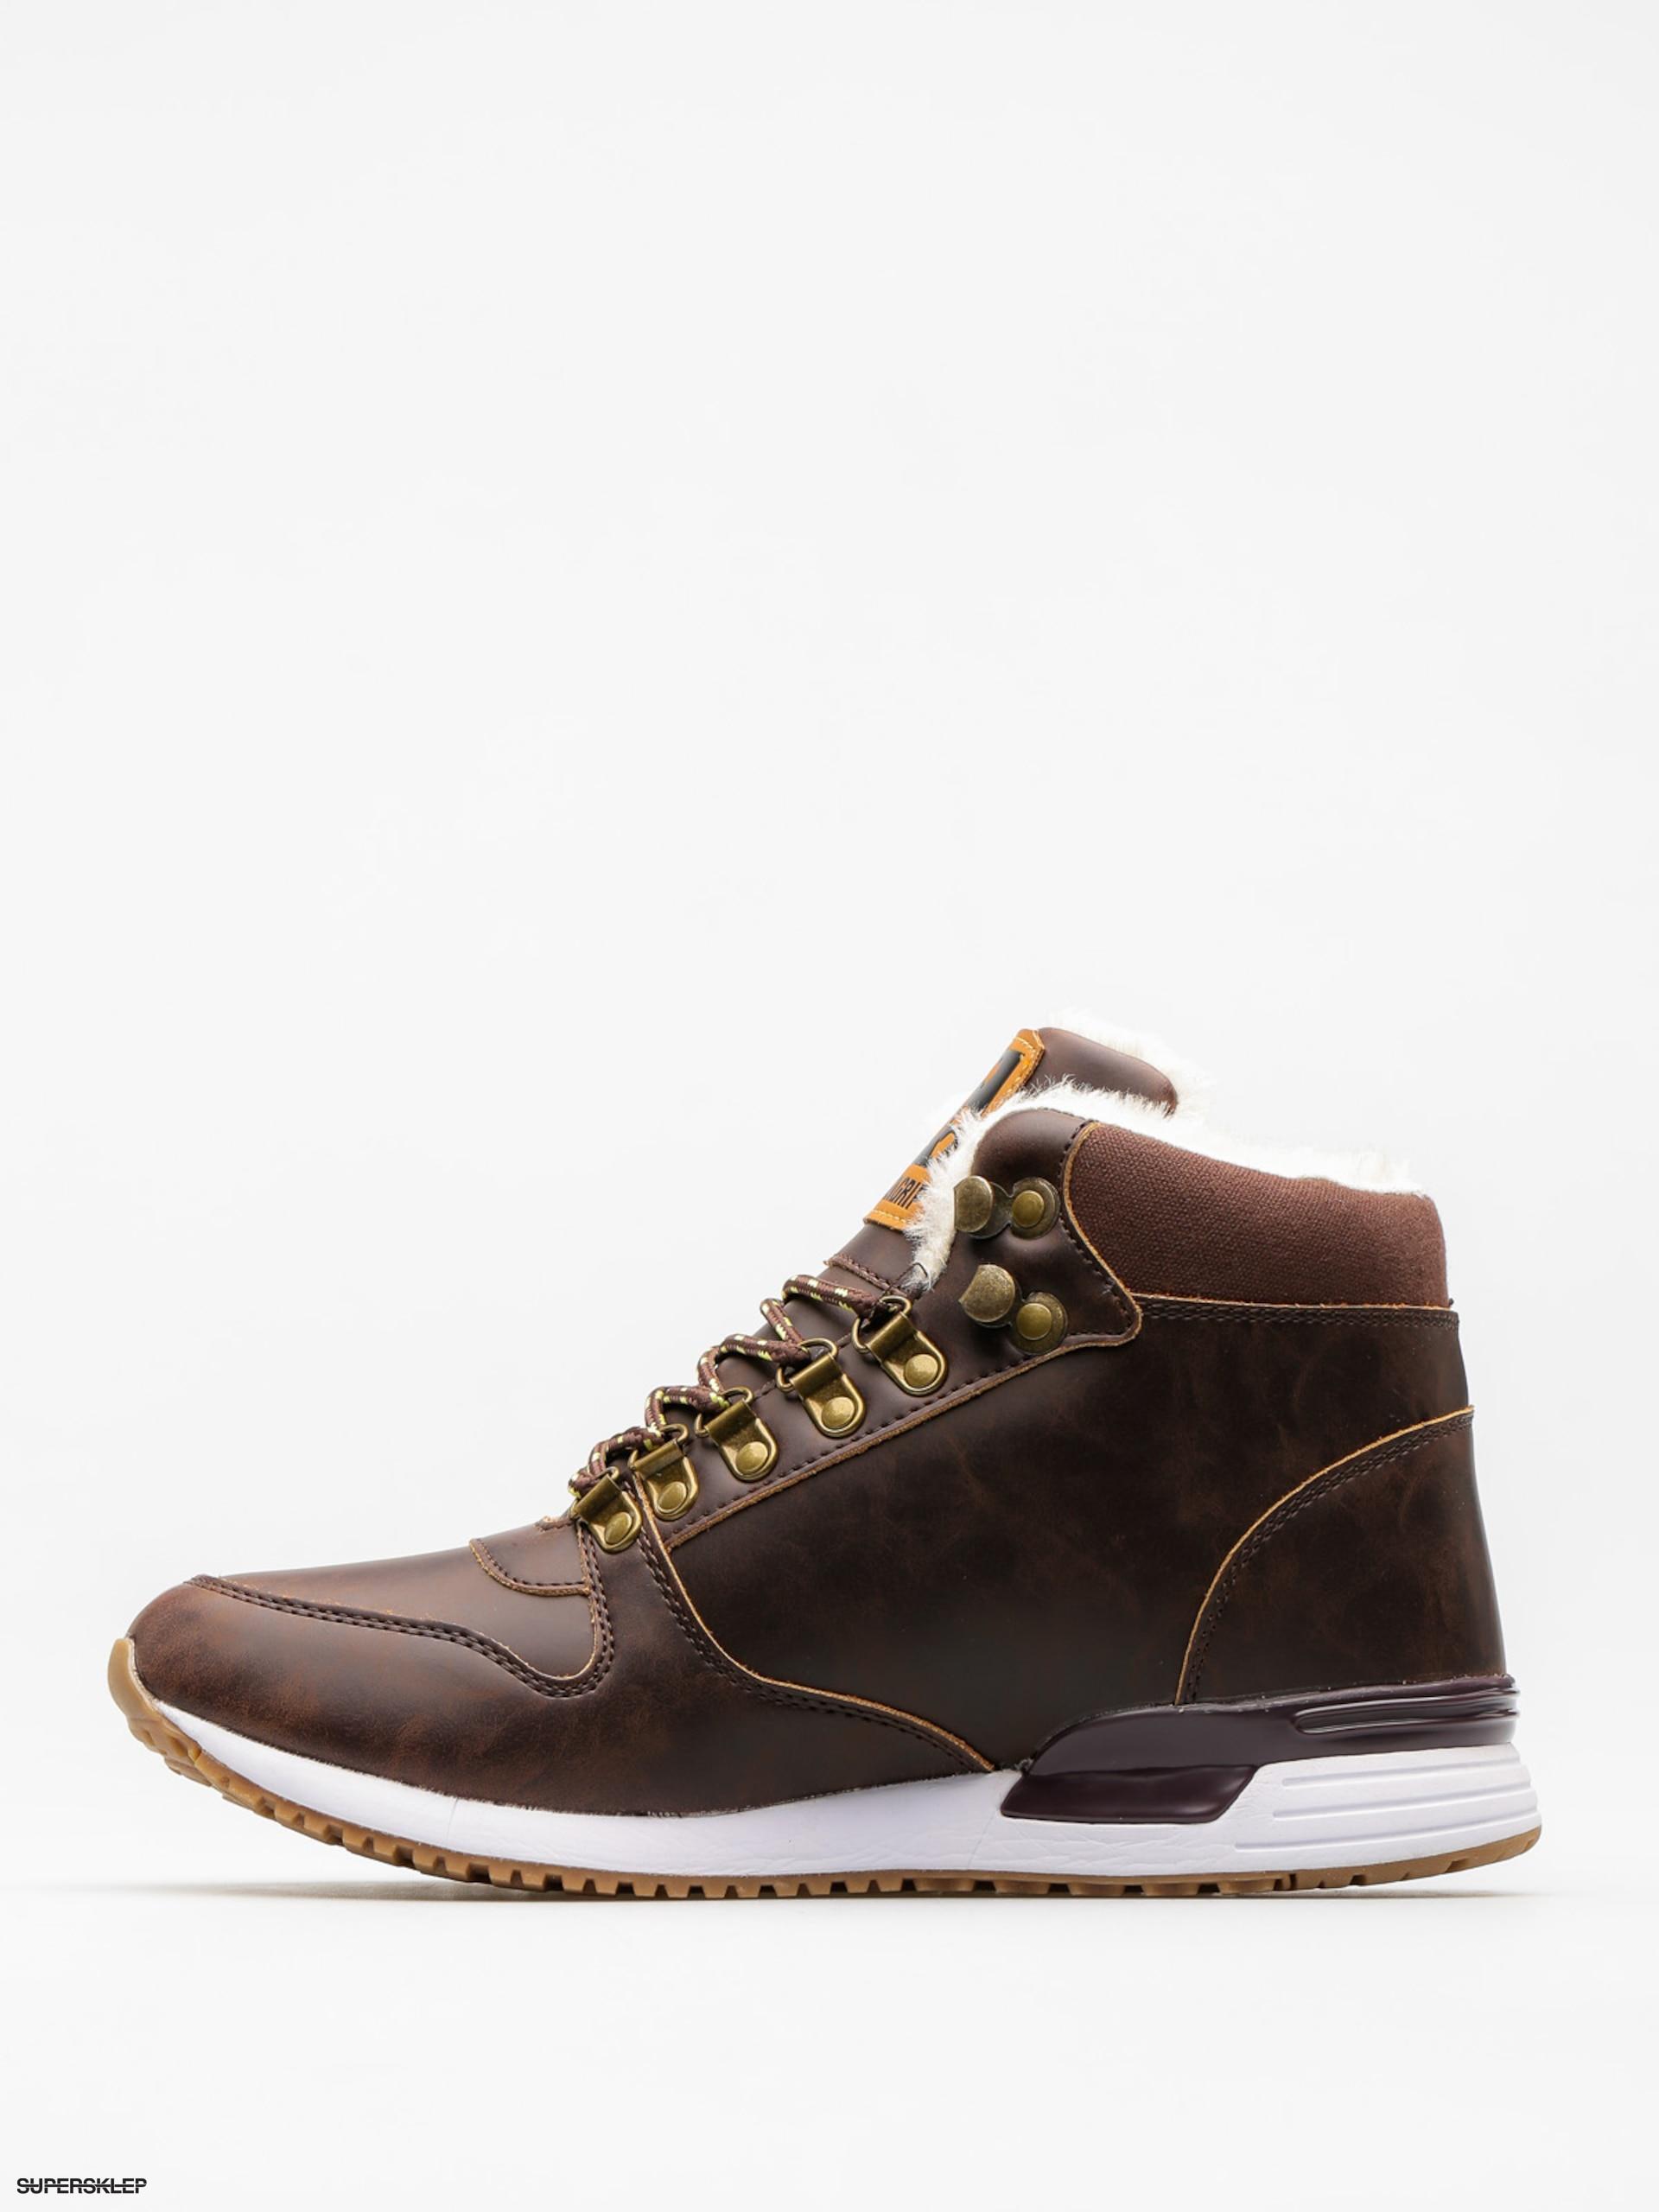 92eccdd3c30 Bustagrip Zimné topánky Custom (brn+wr)